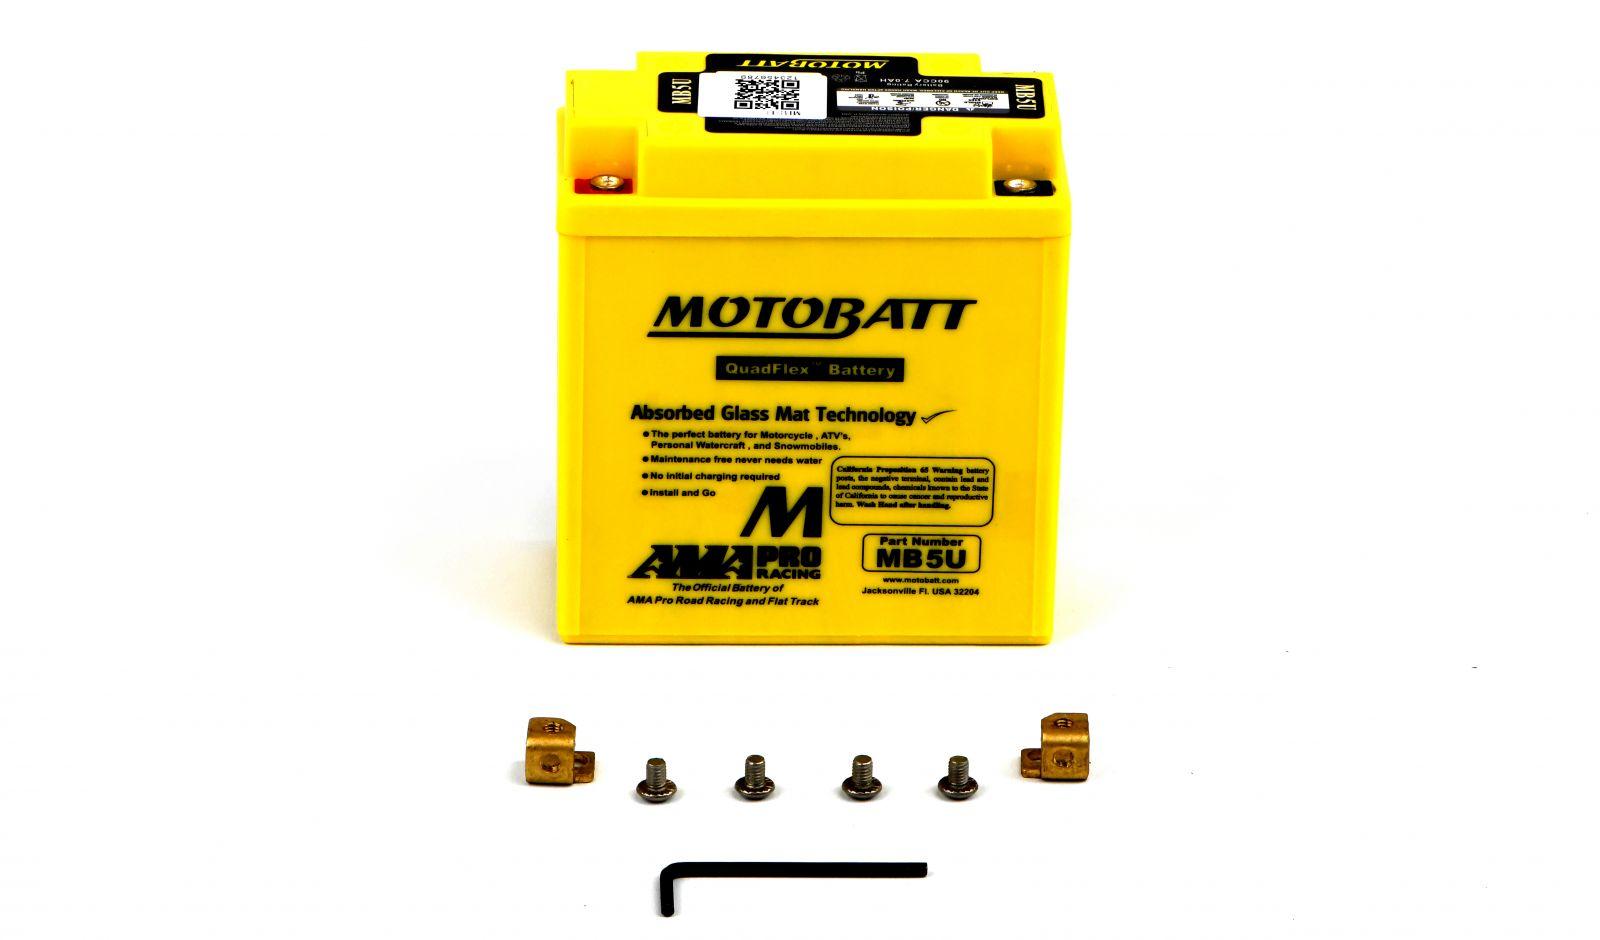 Motobatt Batteries - 501051MY image